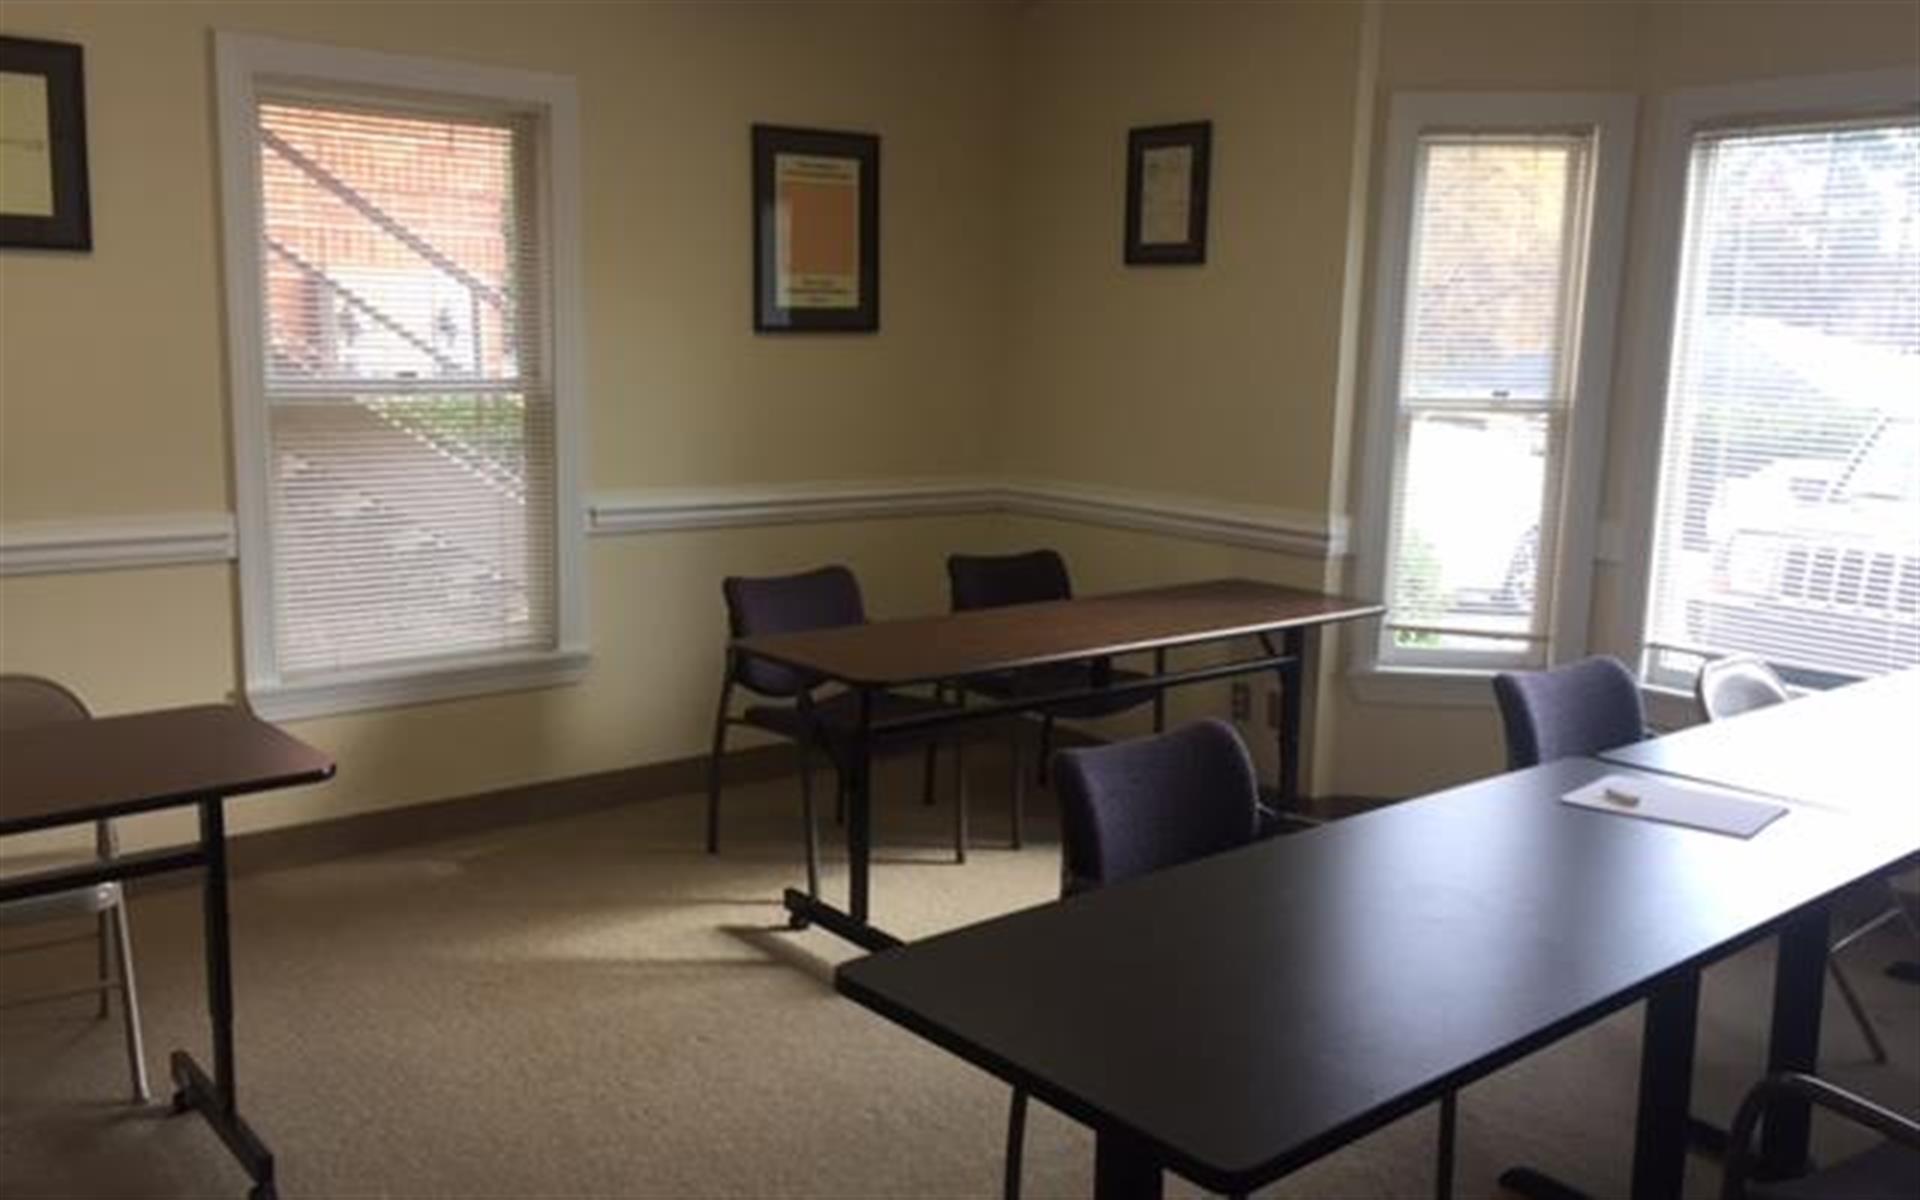 Mindspire Tutoring and Test Prep - Meeting Room 1